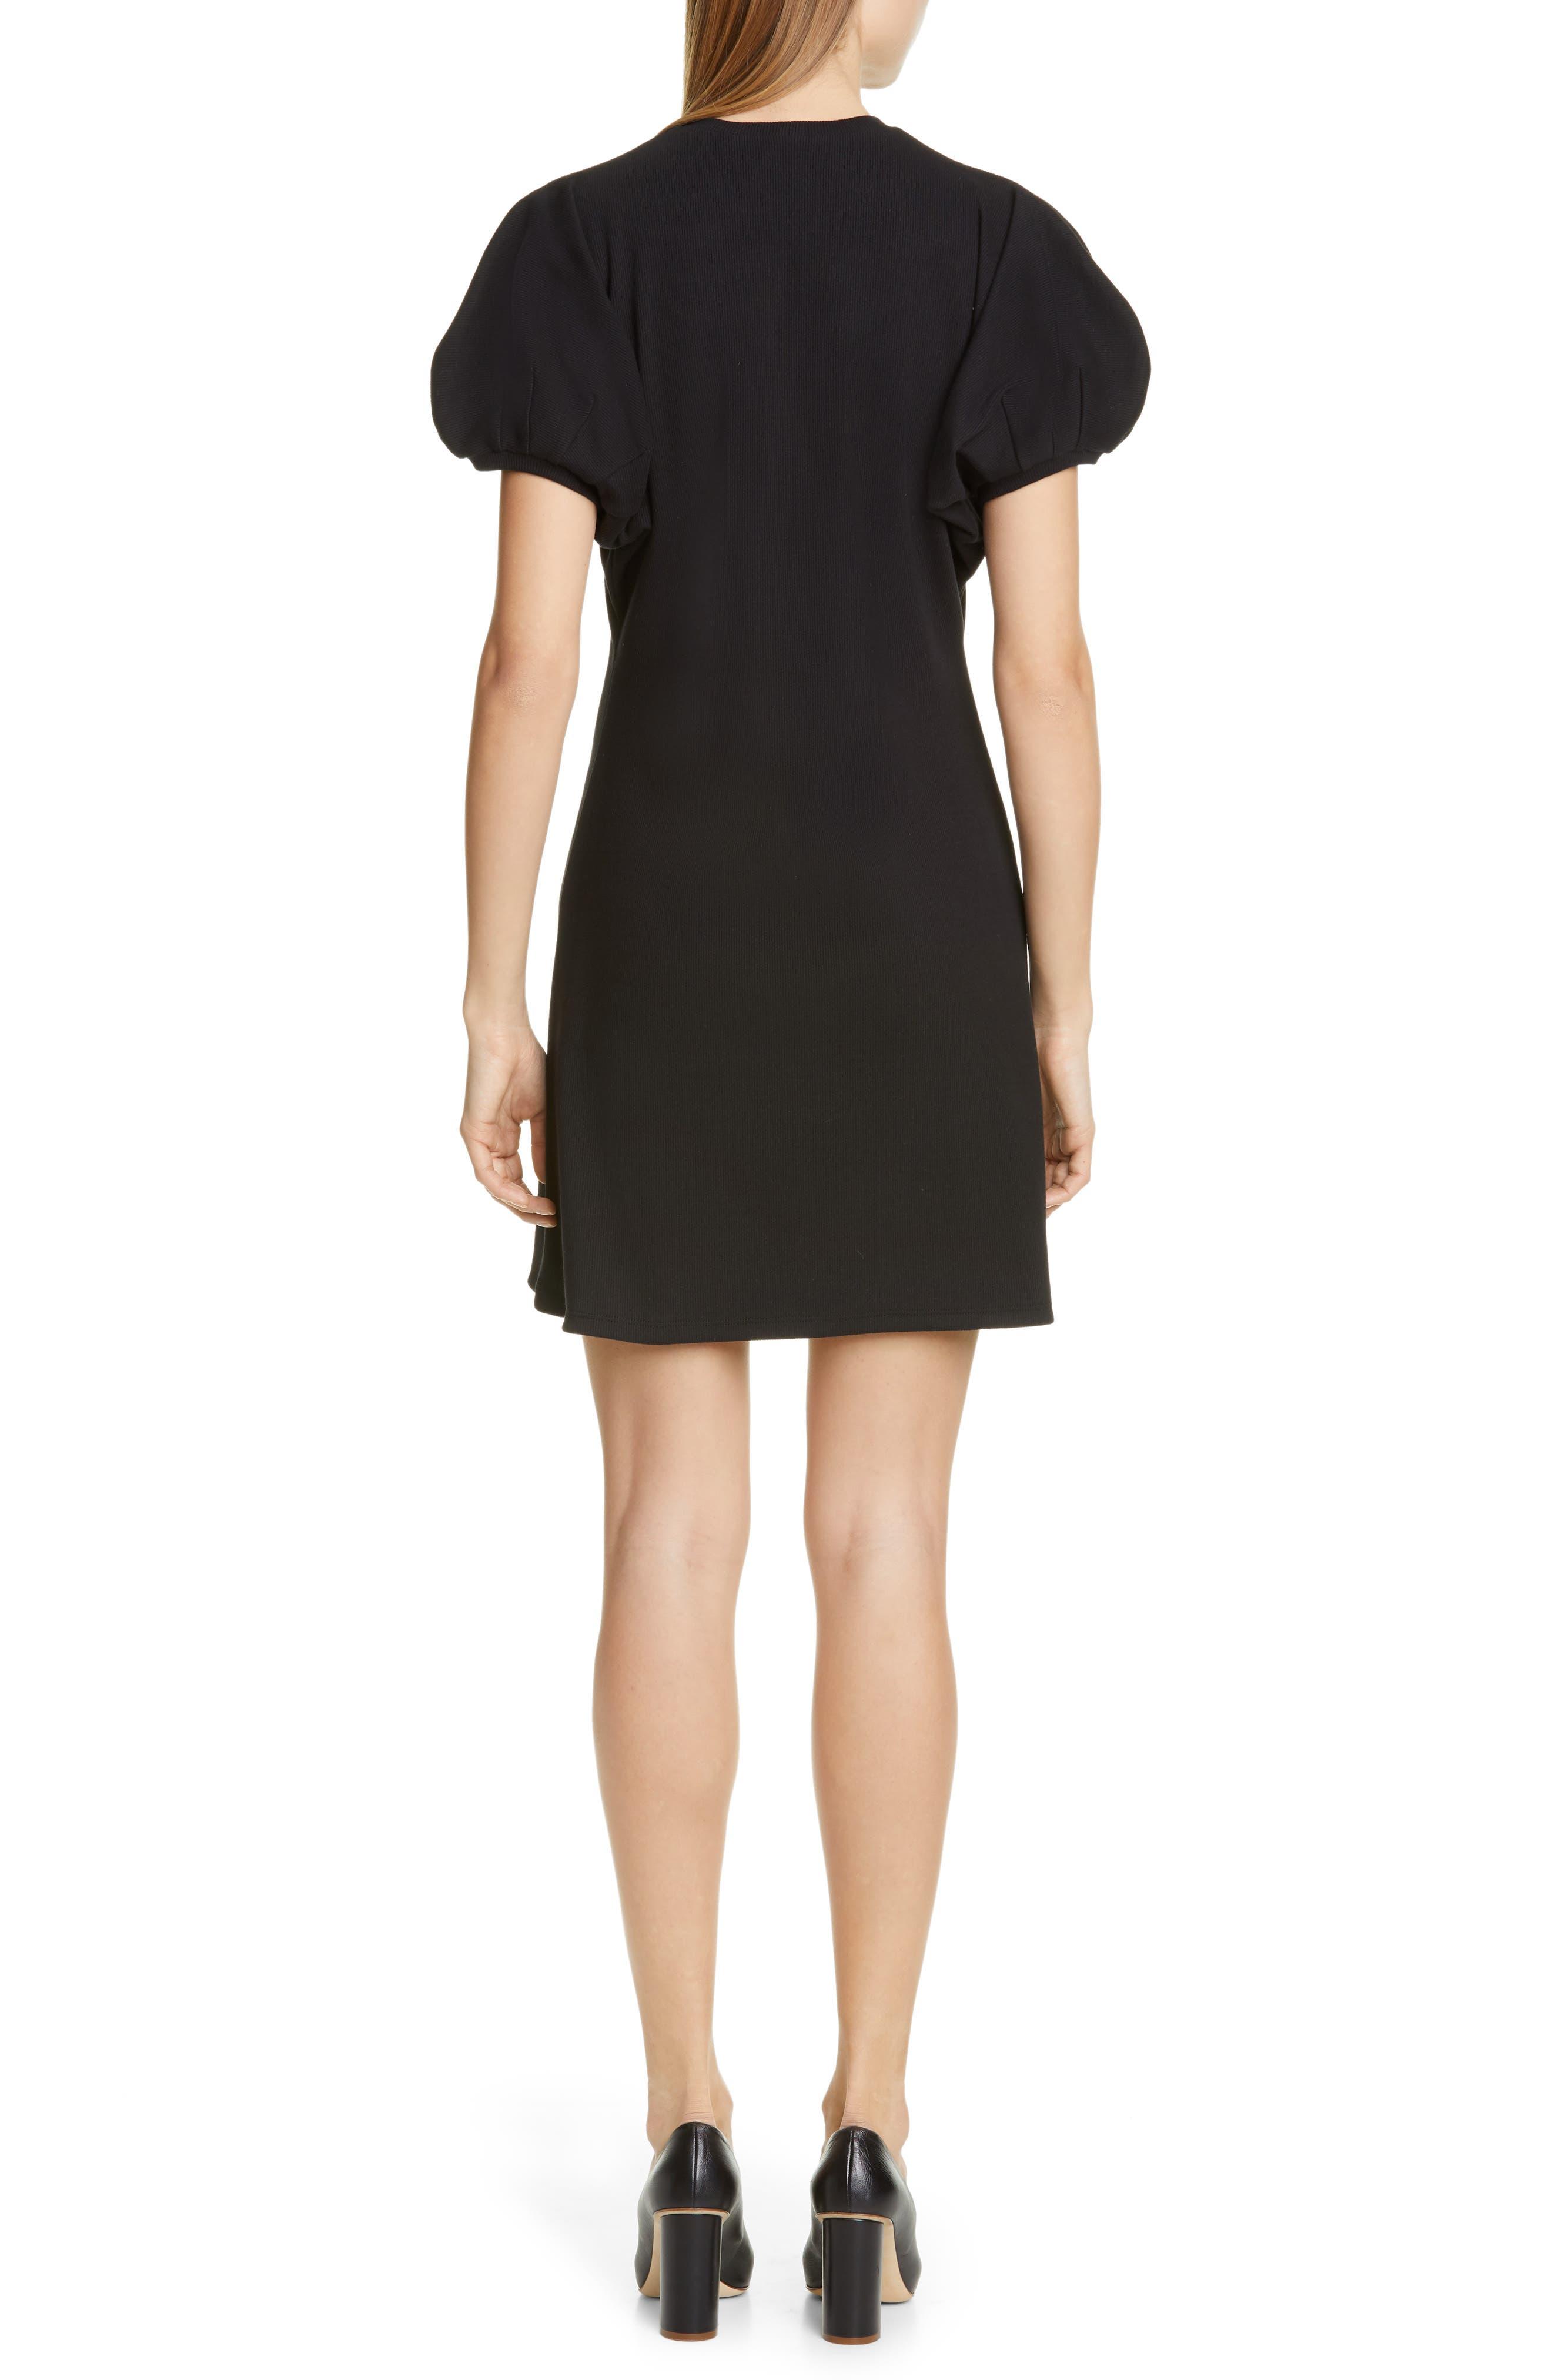 BEAUFILLE, Leda Puff Sleeve Dress, Alternate thumbnail 2, color, BLACK